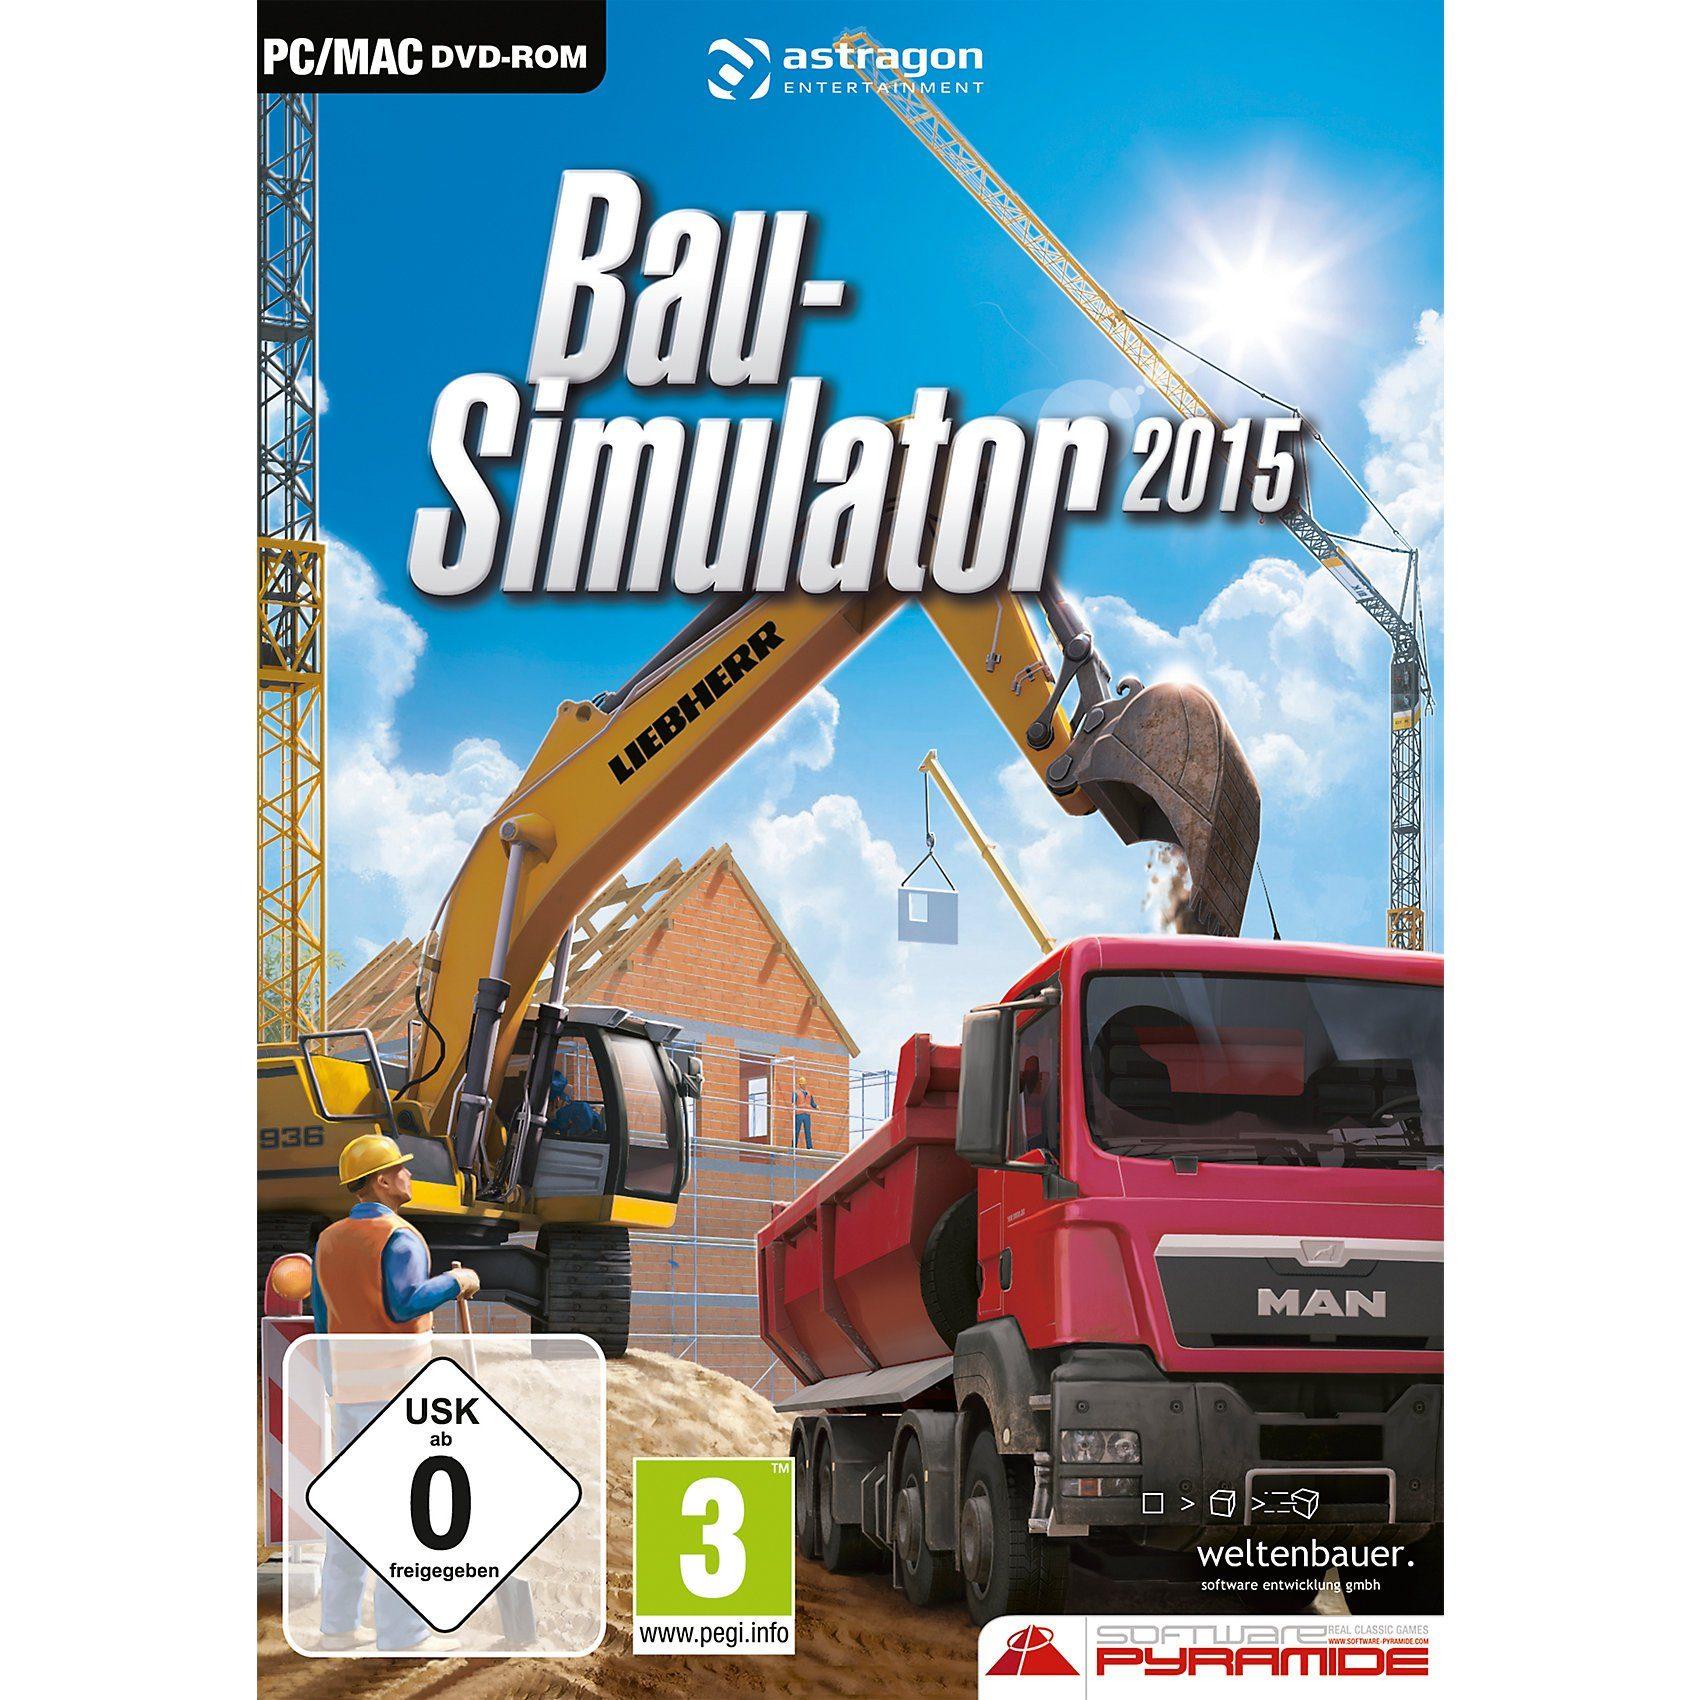 ak tronic PC Bau-Simulator 2015